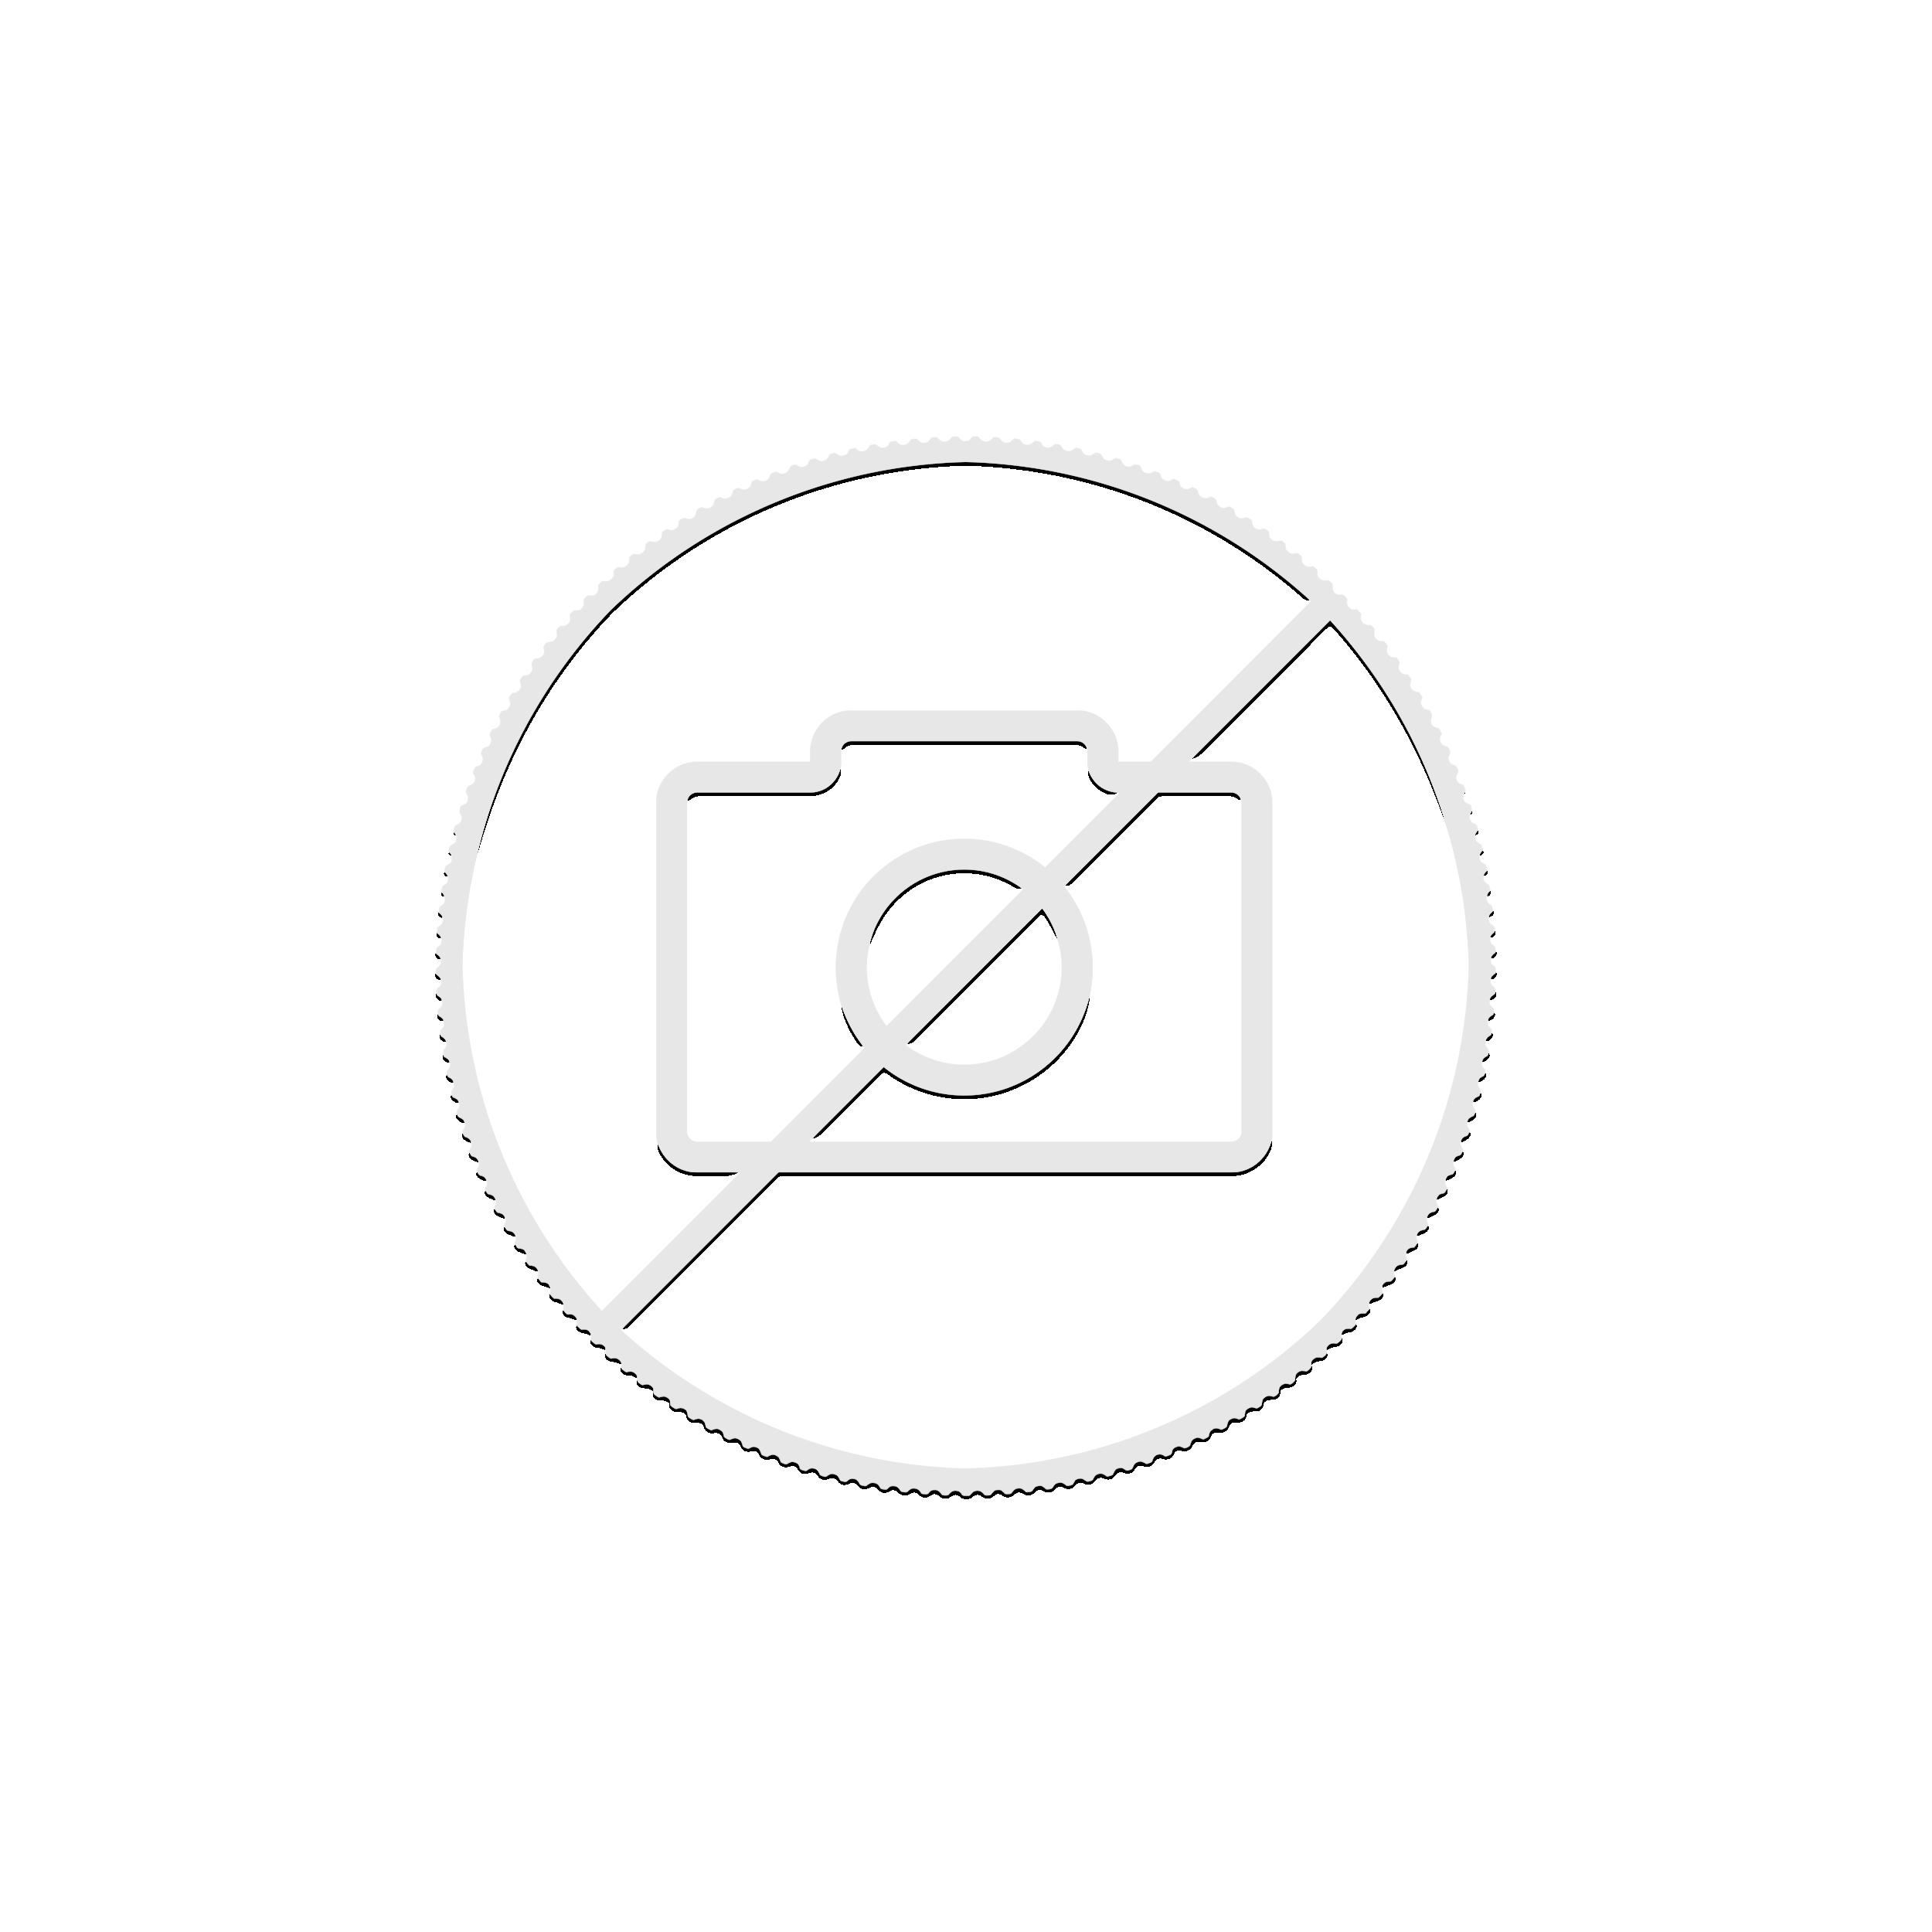 1 Troy ounce zilveren munt Disney Villains - Ursula 2019